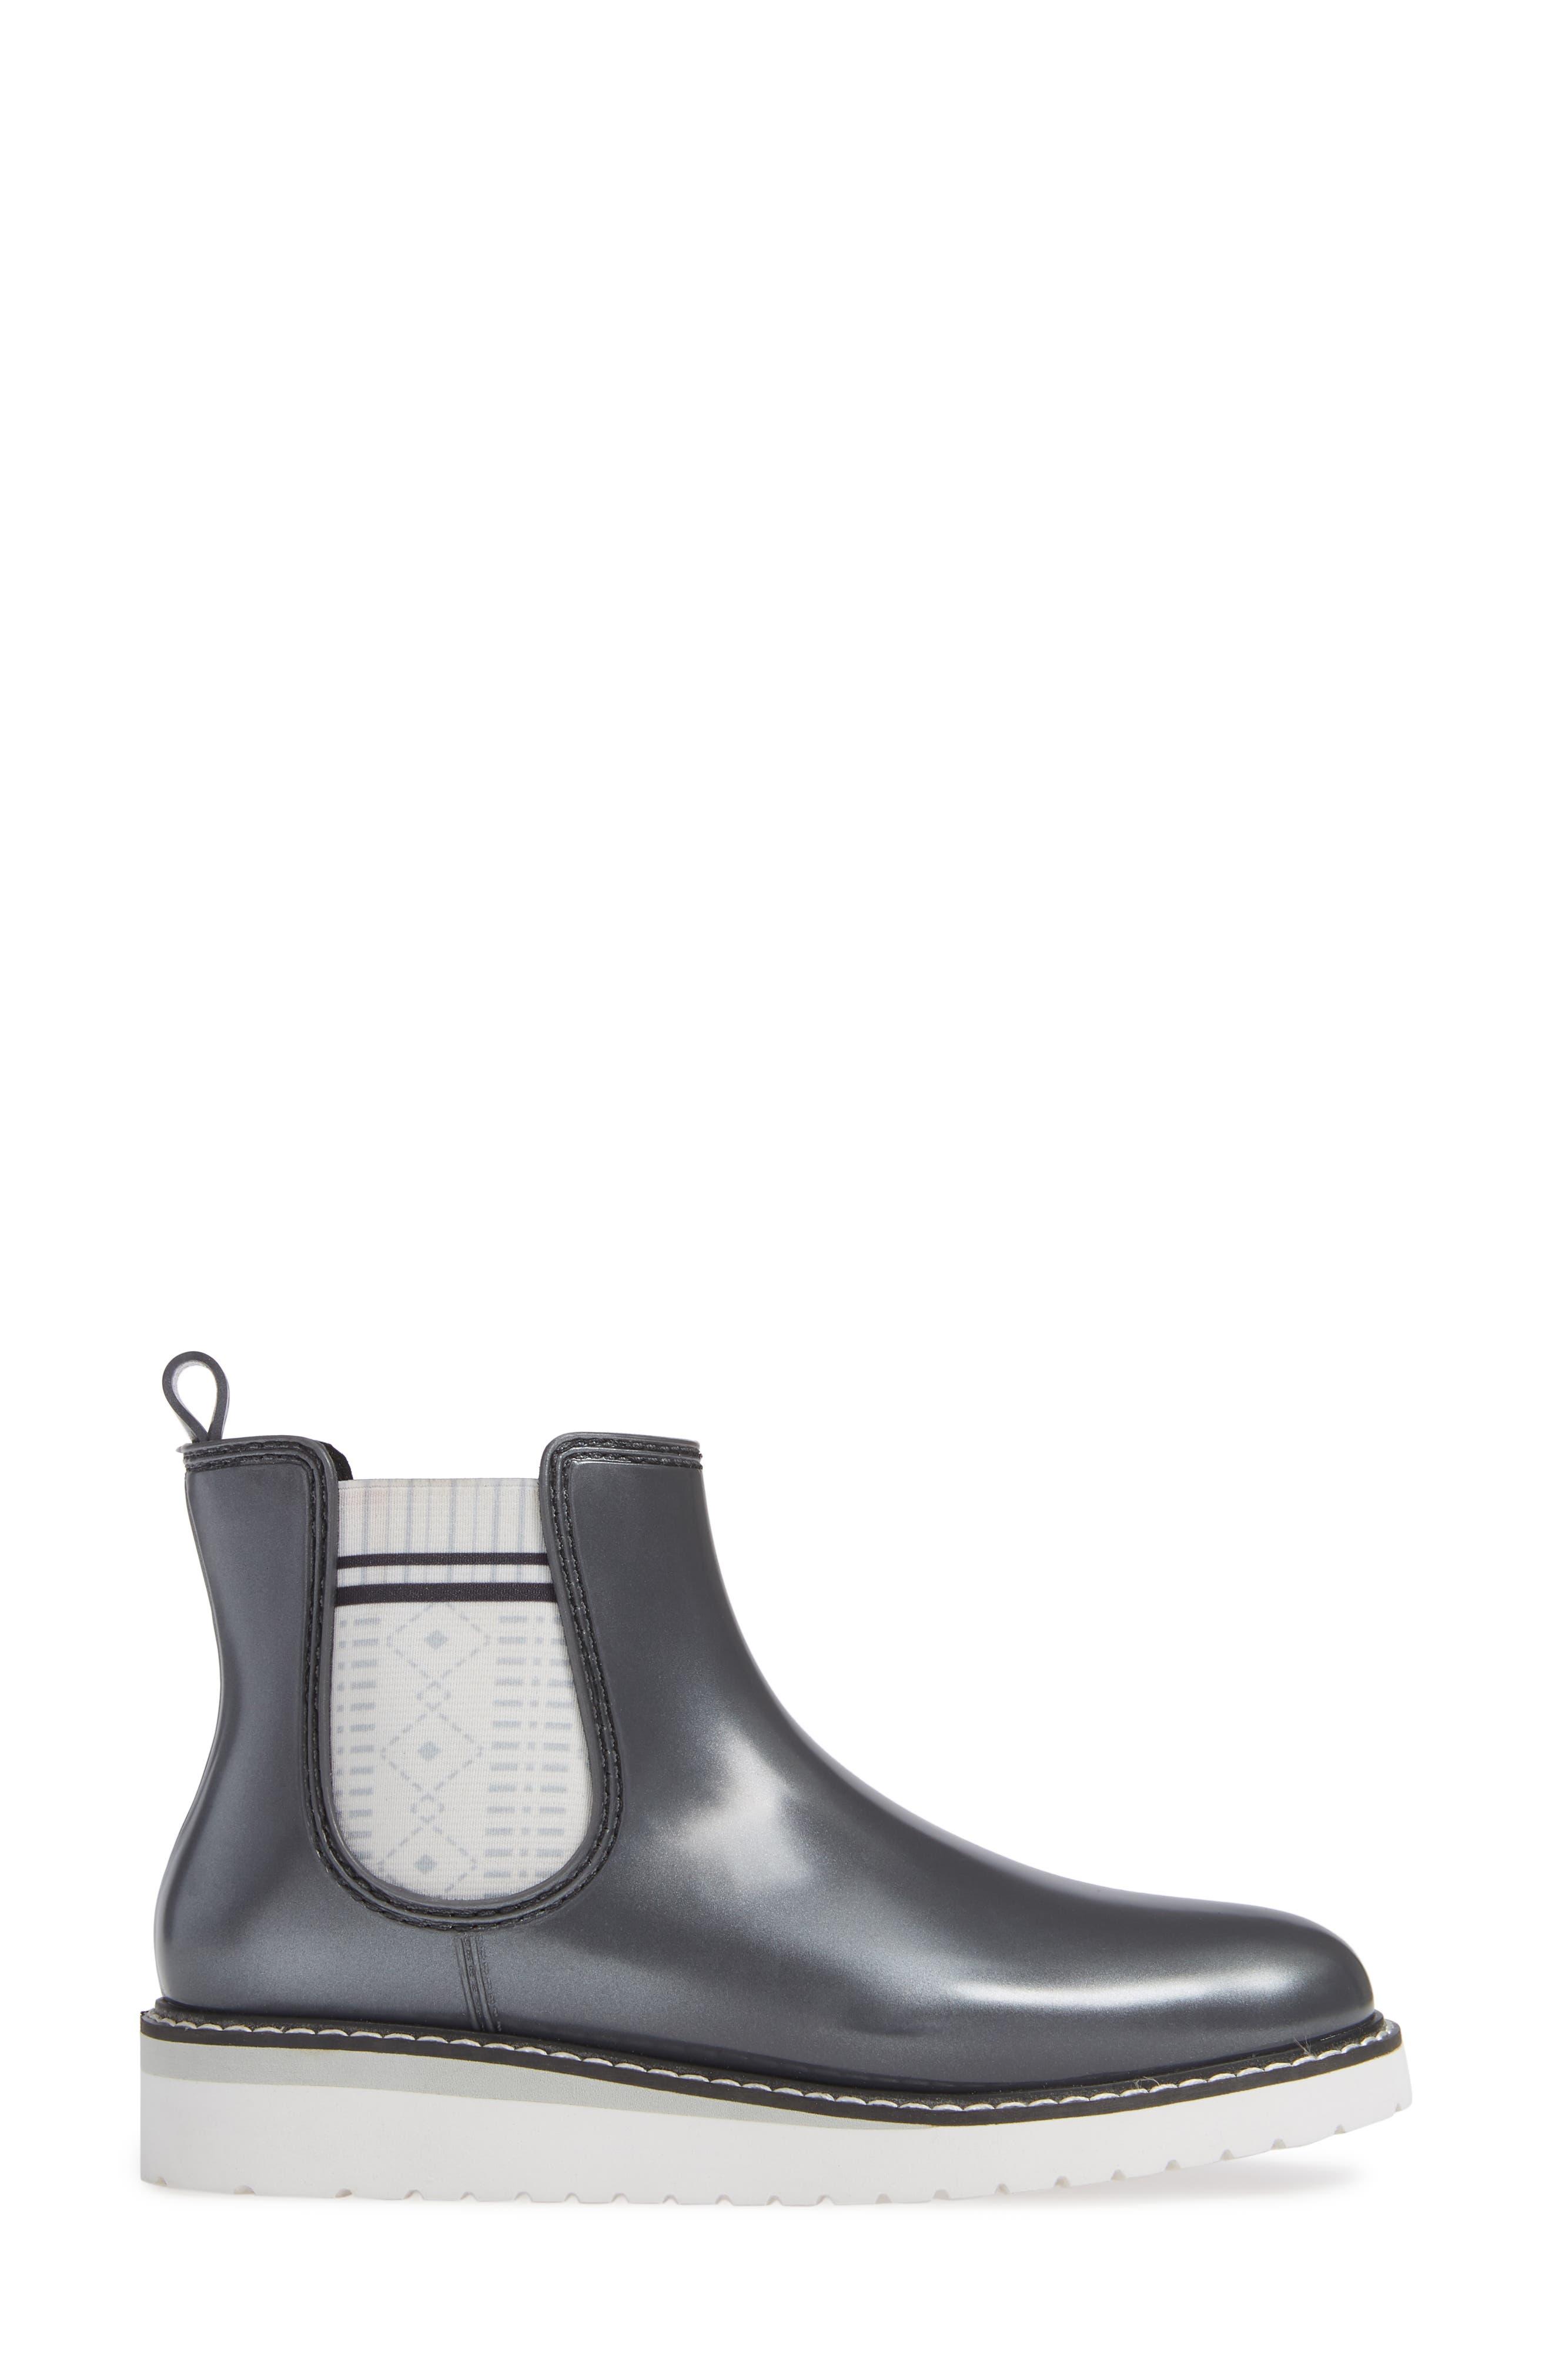 Kensington Chelsea Rain Boot,                             Alternate thumbnail 3, color,                             SILVER METALLIC